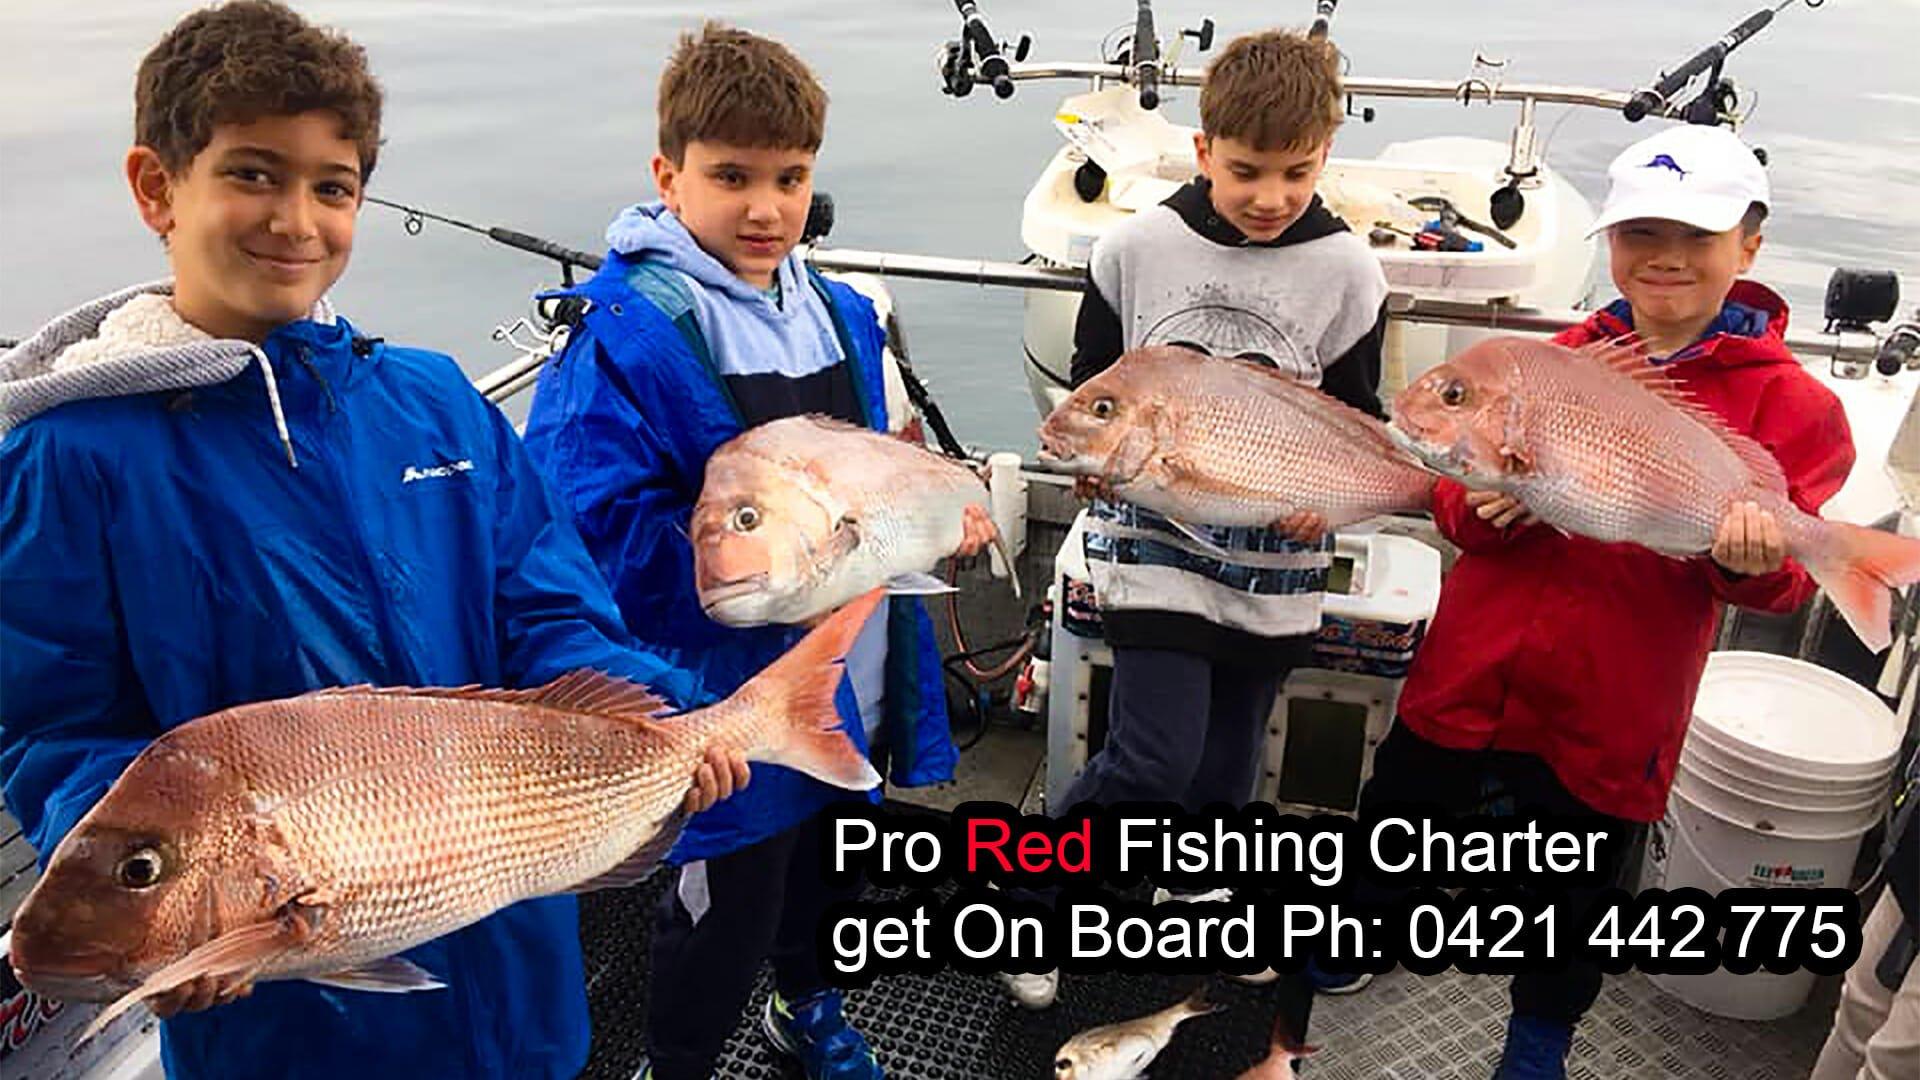 snapper fishing, port phillip bay, prored fishing charters , snapper charters melbourne, fishing melbourne, fishing charter western port, fishing charter port phillip bay